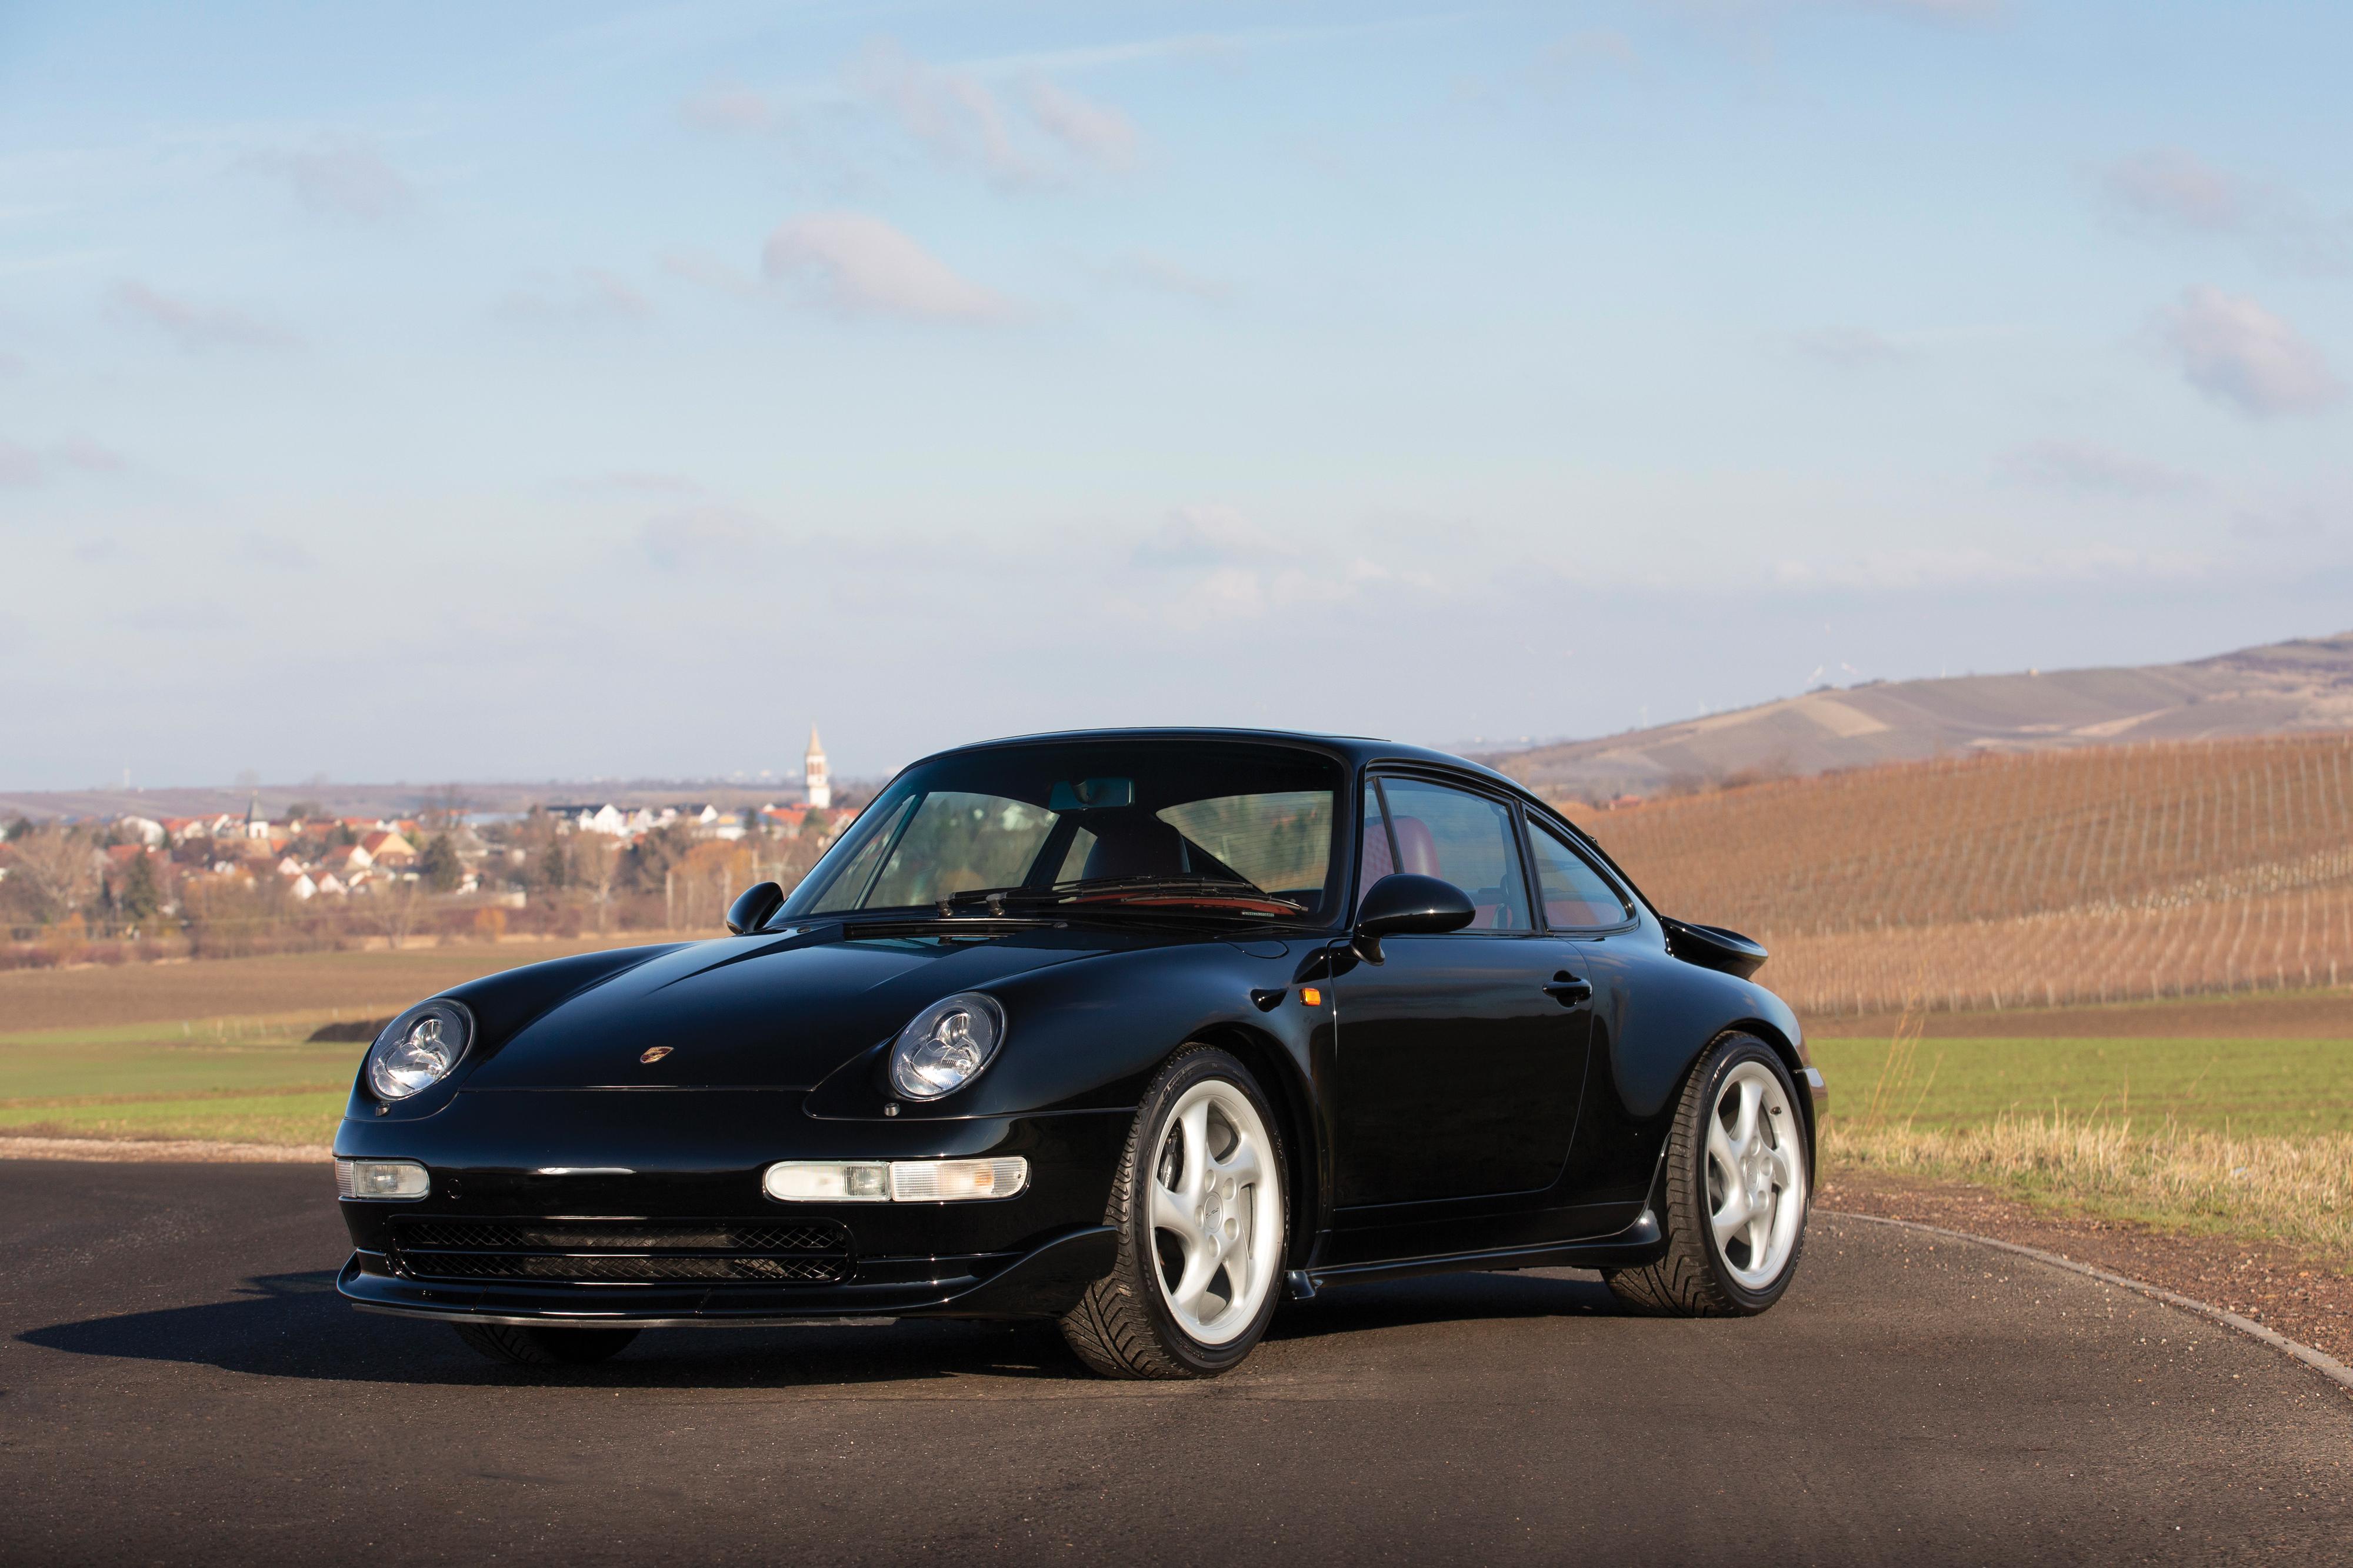 1994 Porsche 911 Turbo Prototype - RM Sotheby's Essen Sale